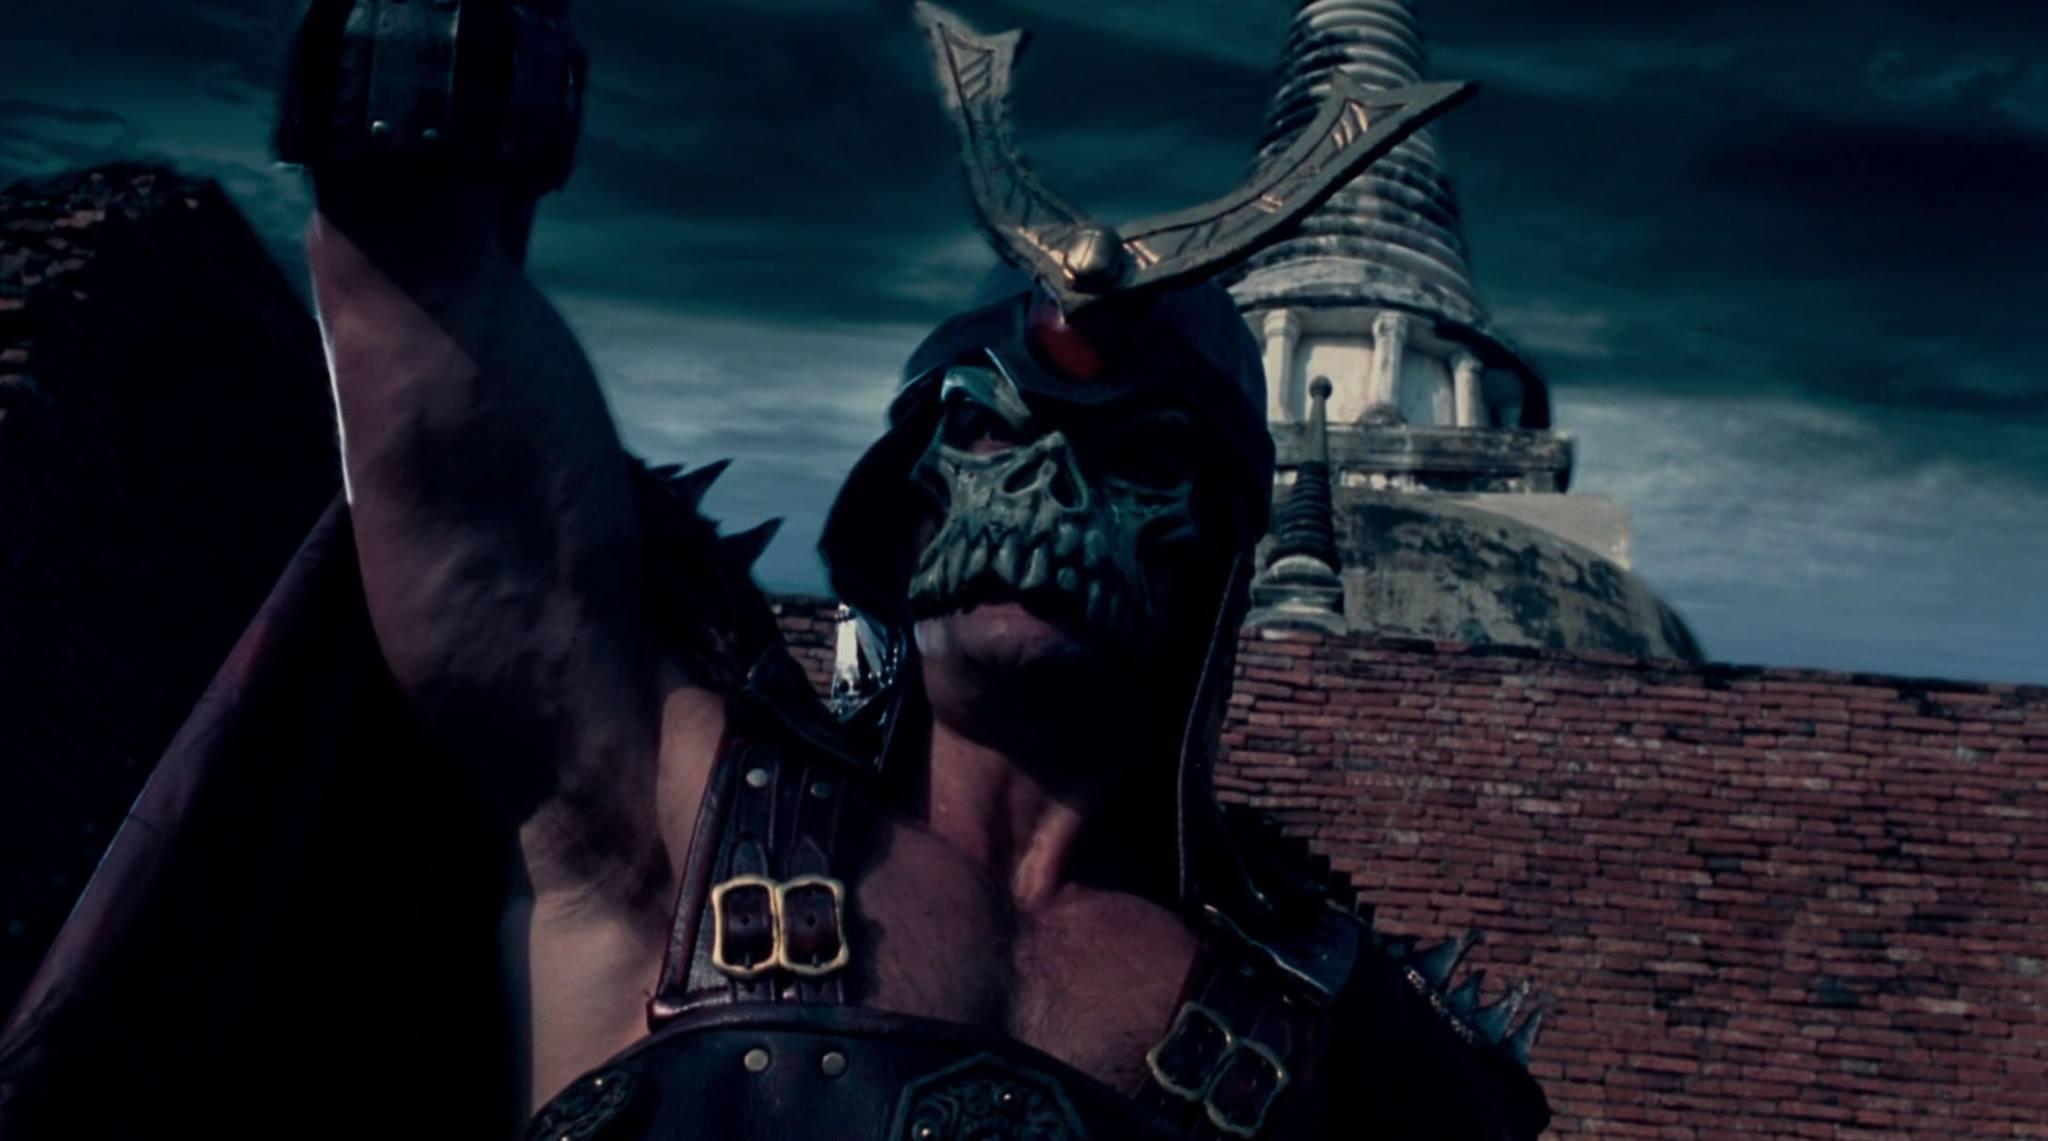 Mortal Kombat Mortal Kombat Annihilation The Old Switcheroo